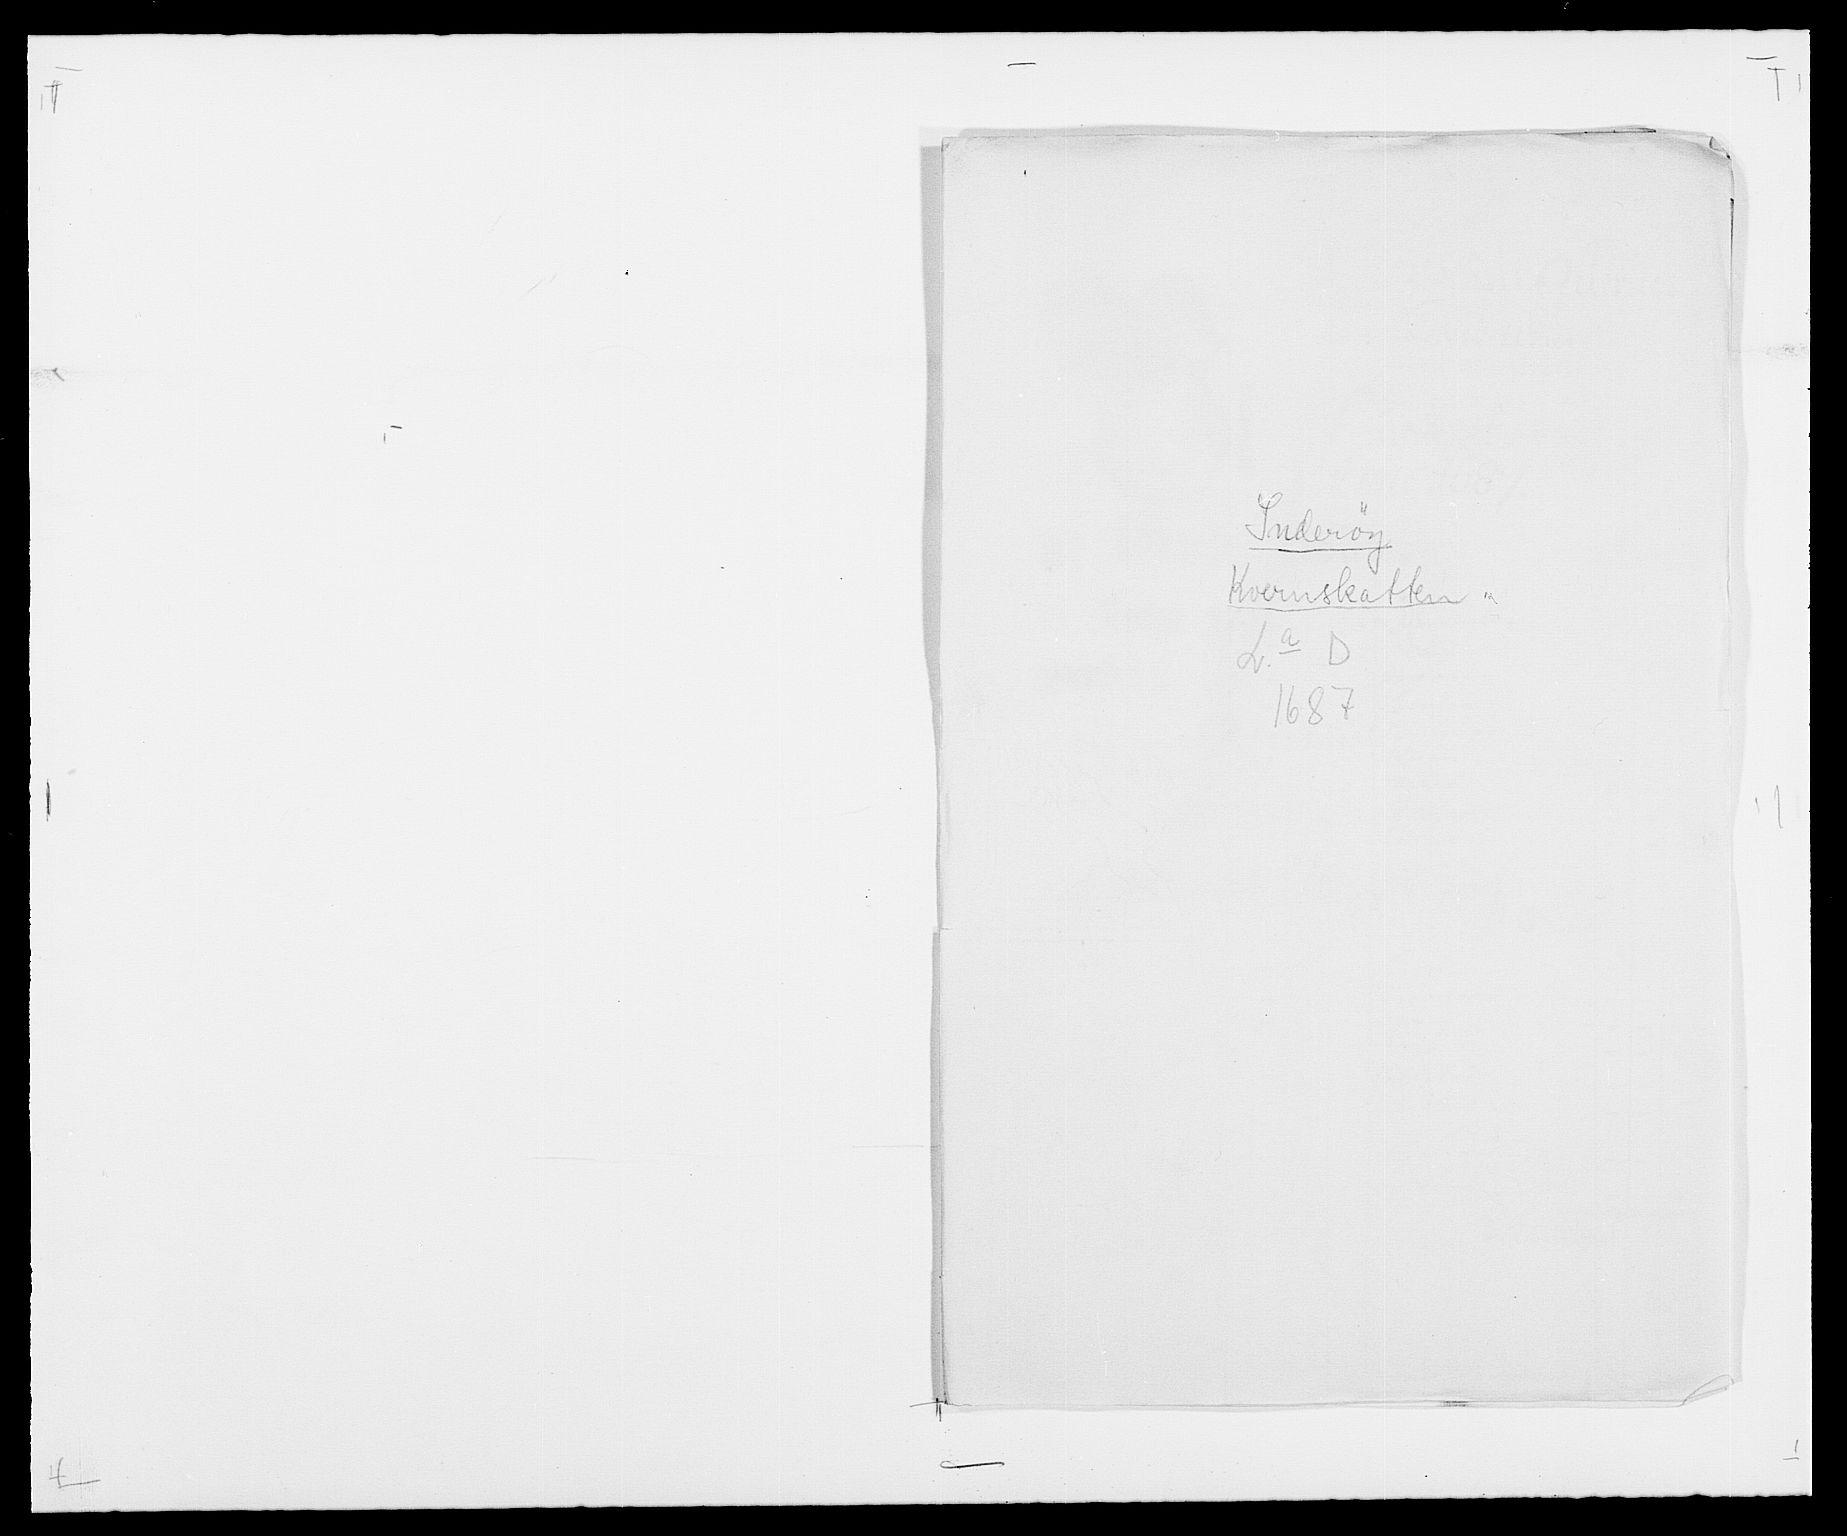 RA, Rentekammeret inntil 1814, Reviderte regnskaper, Fogderegnskap, R63/L4306: Fogderegnskap Inderøy, 1687-1689, s. 85